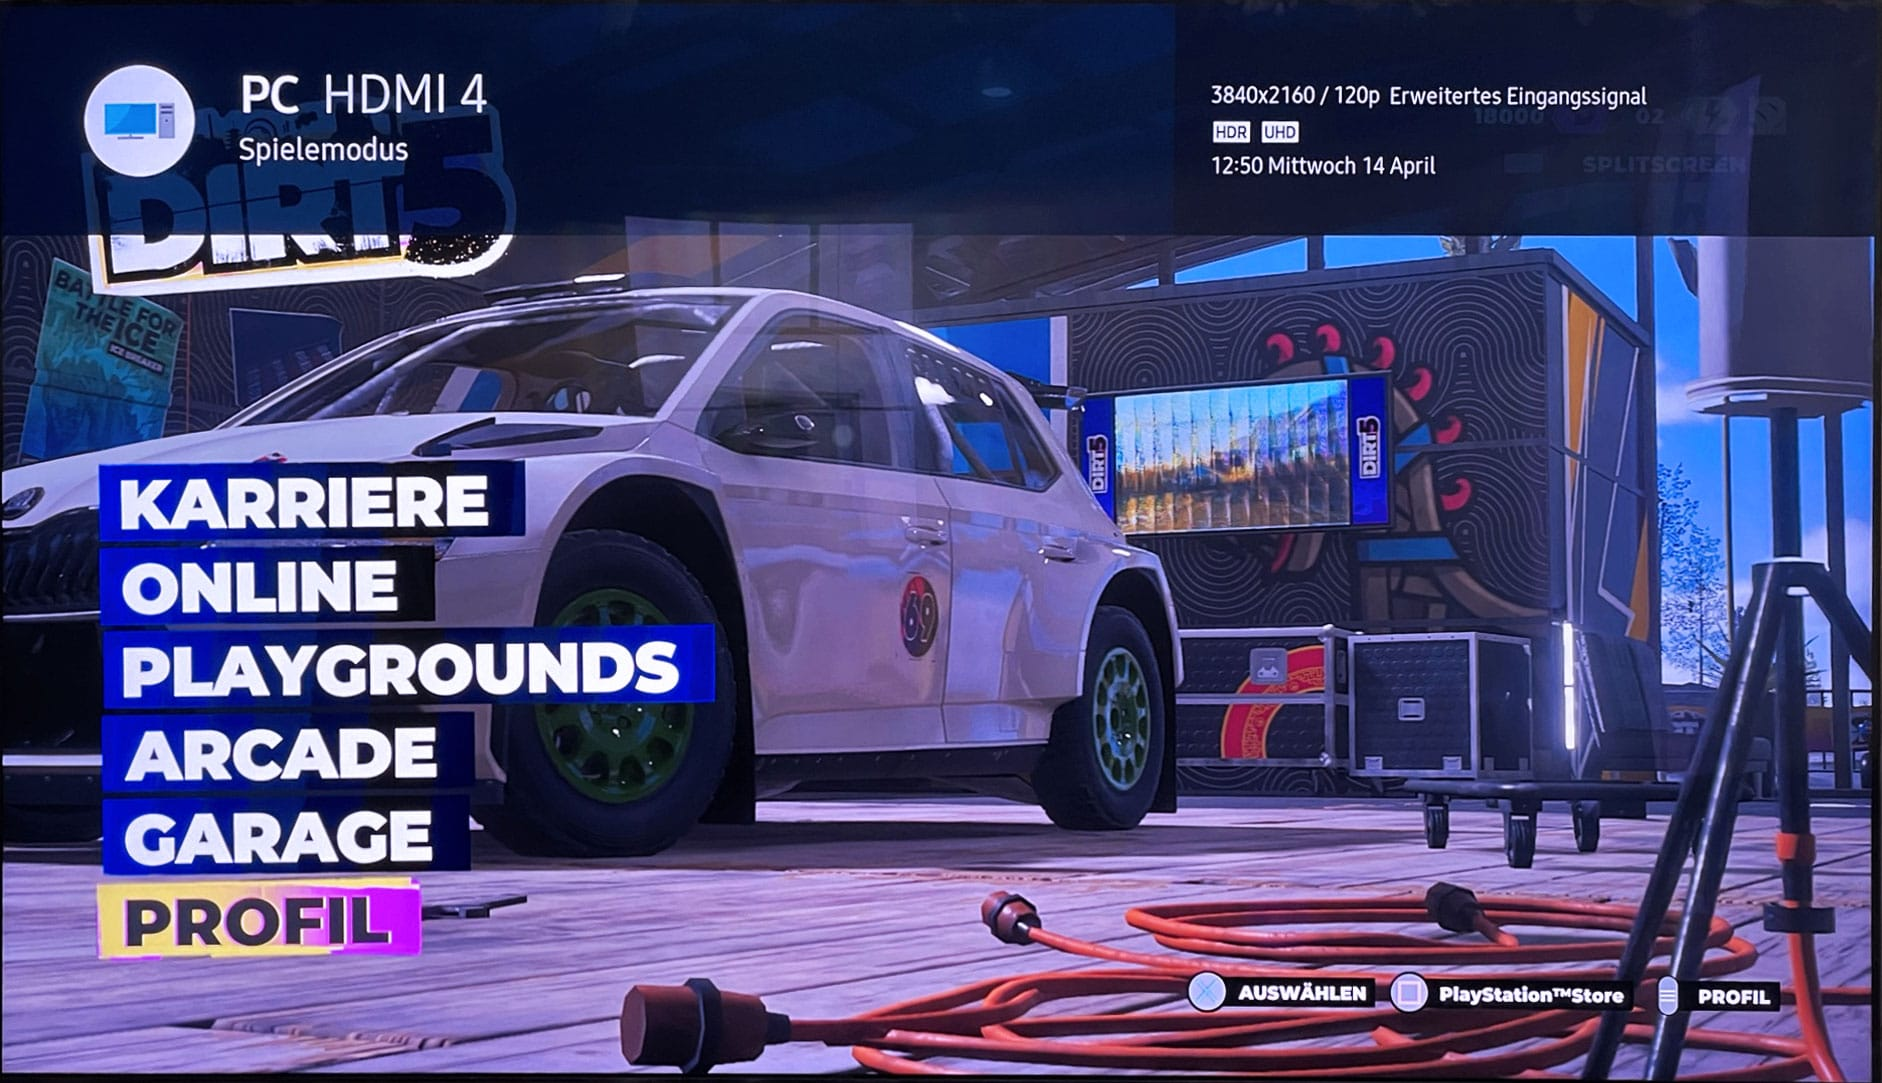 Sony-PS5-April-Update-behebt-4K-120Hz-HDR-Problem-auf-Samsung-QLED-TVs